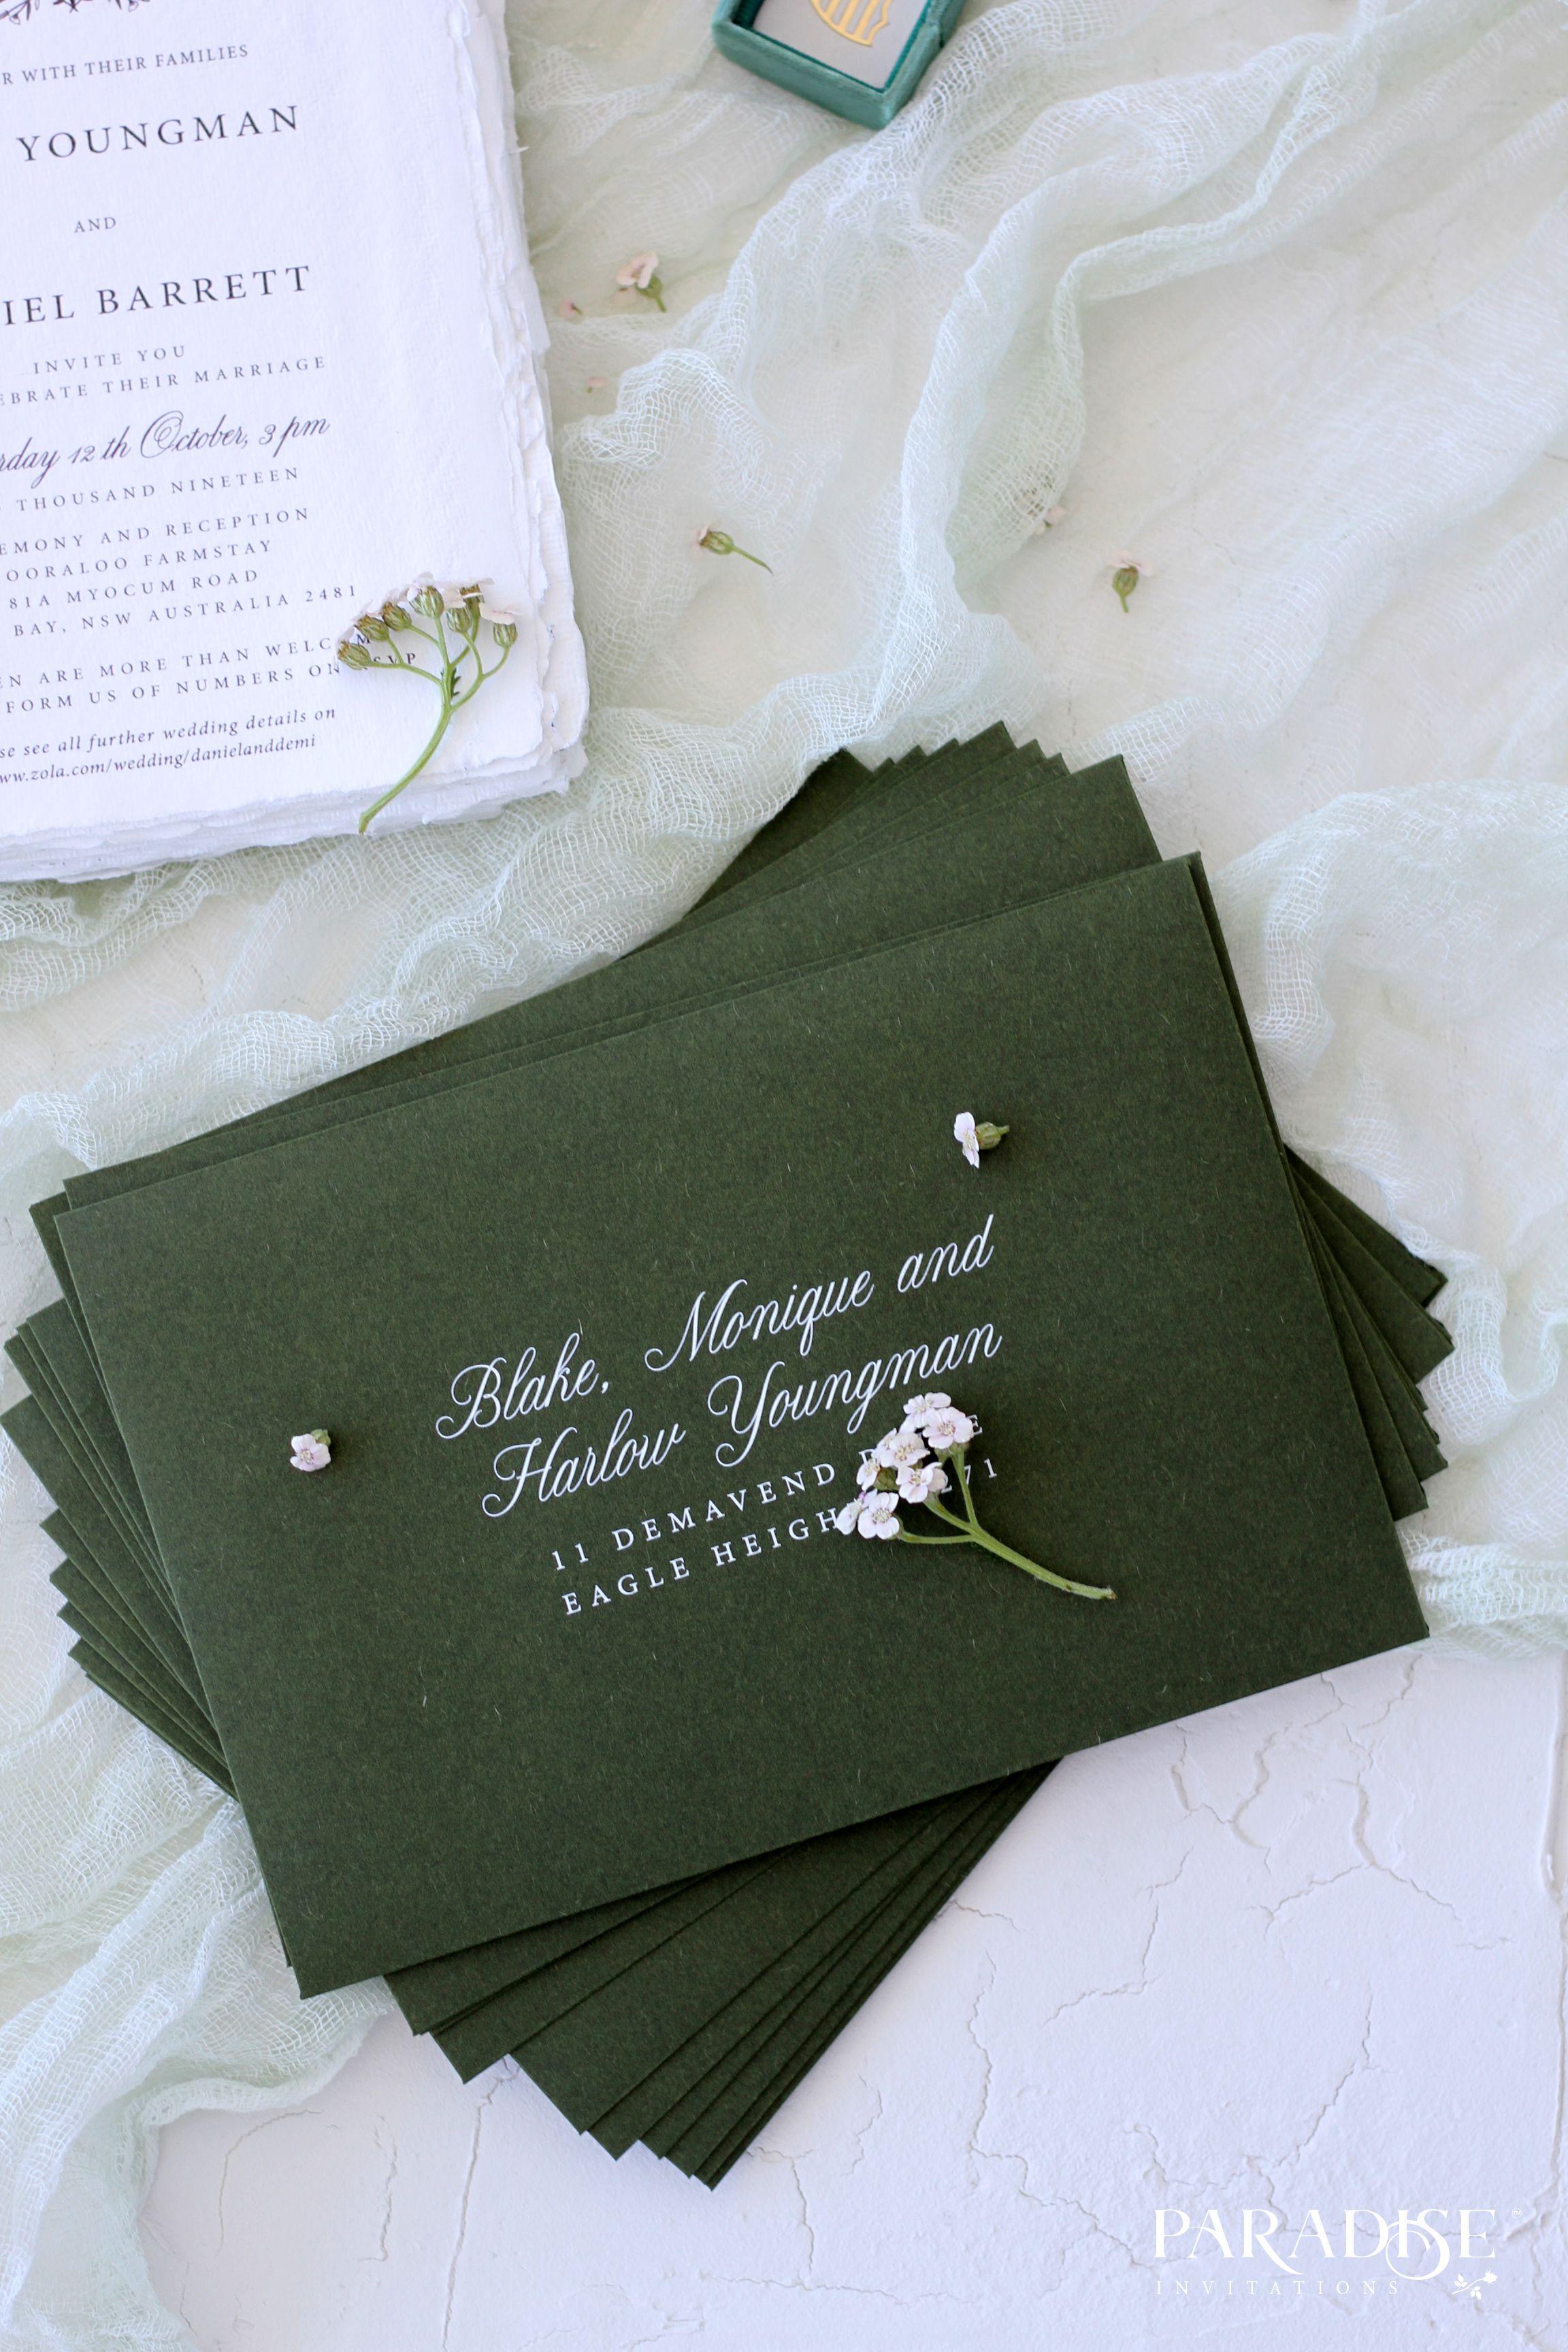 Elegant Dark Green Envelopes Wedding Stationery Weddingstationery Envelopes Wedd Green Wedding Invitations Dark Green Wedding Wedding Invitation Envelopes